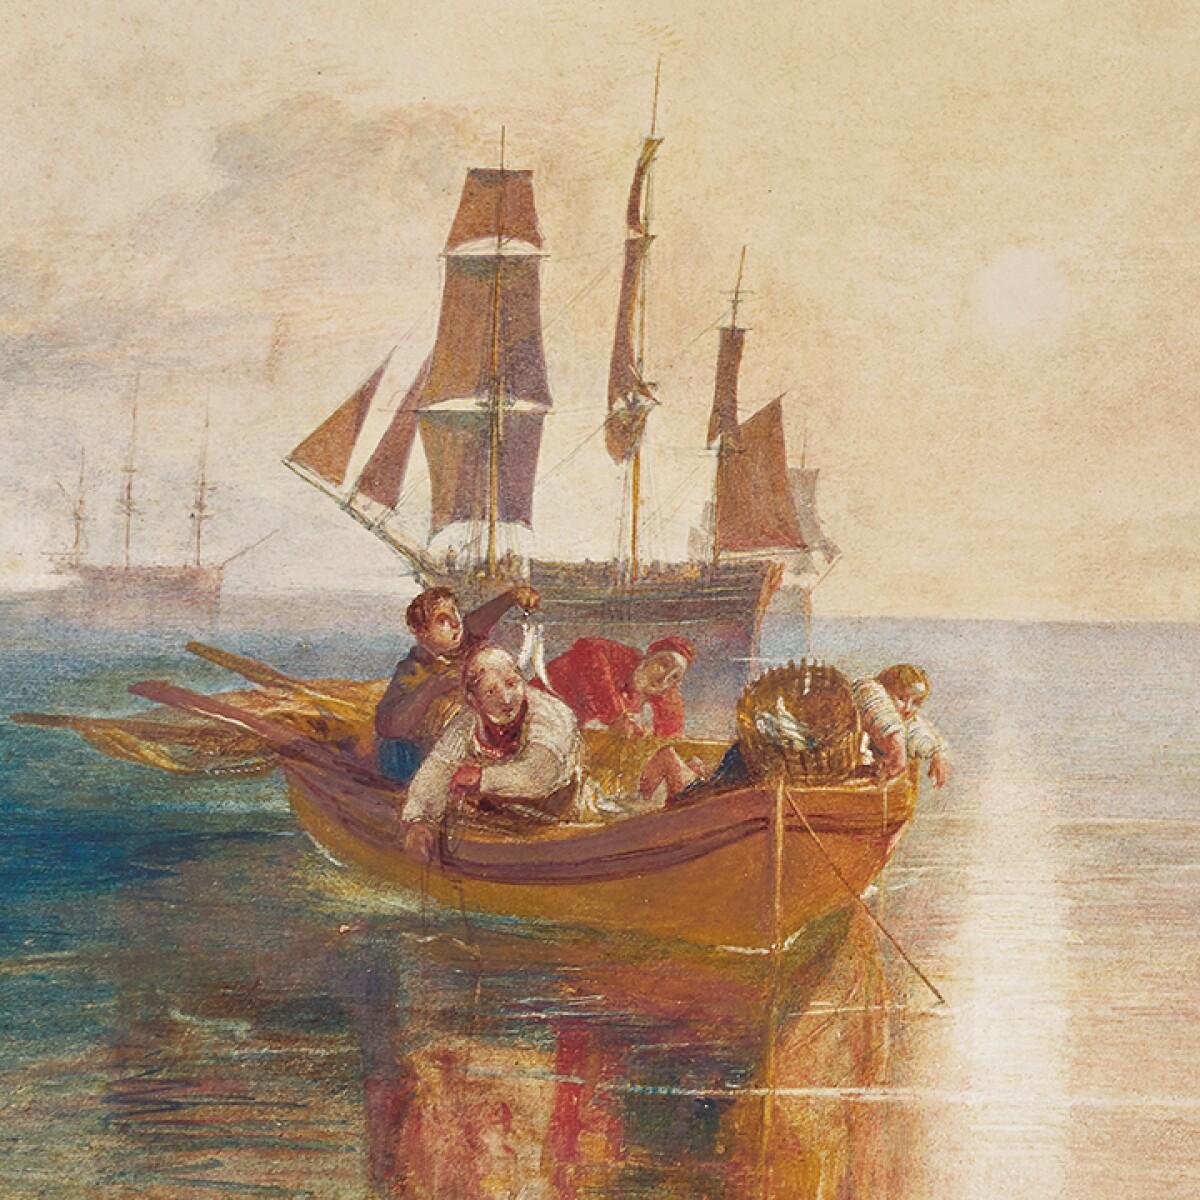 The Magical Light of Turner's Margate